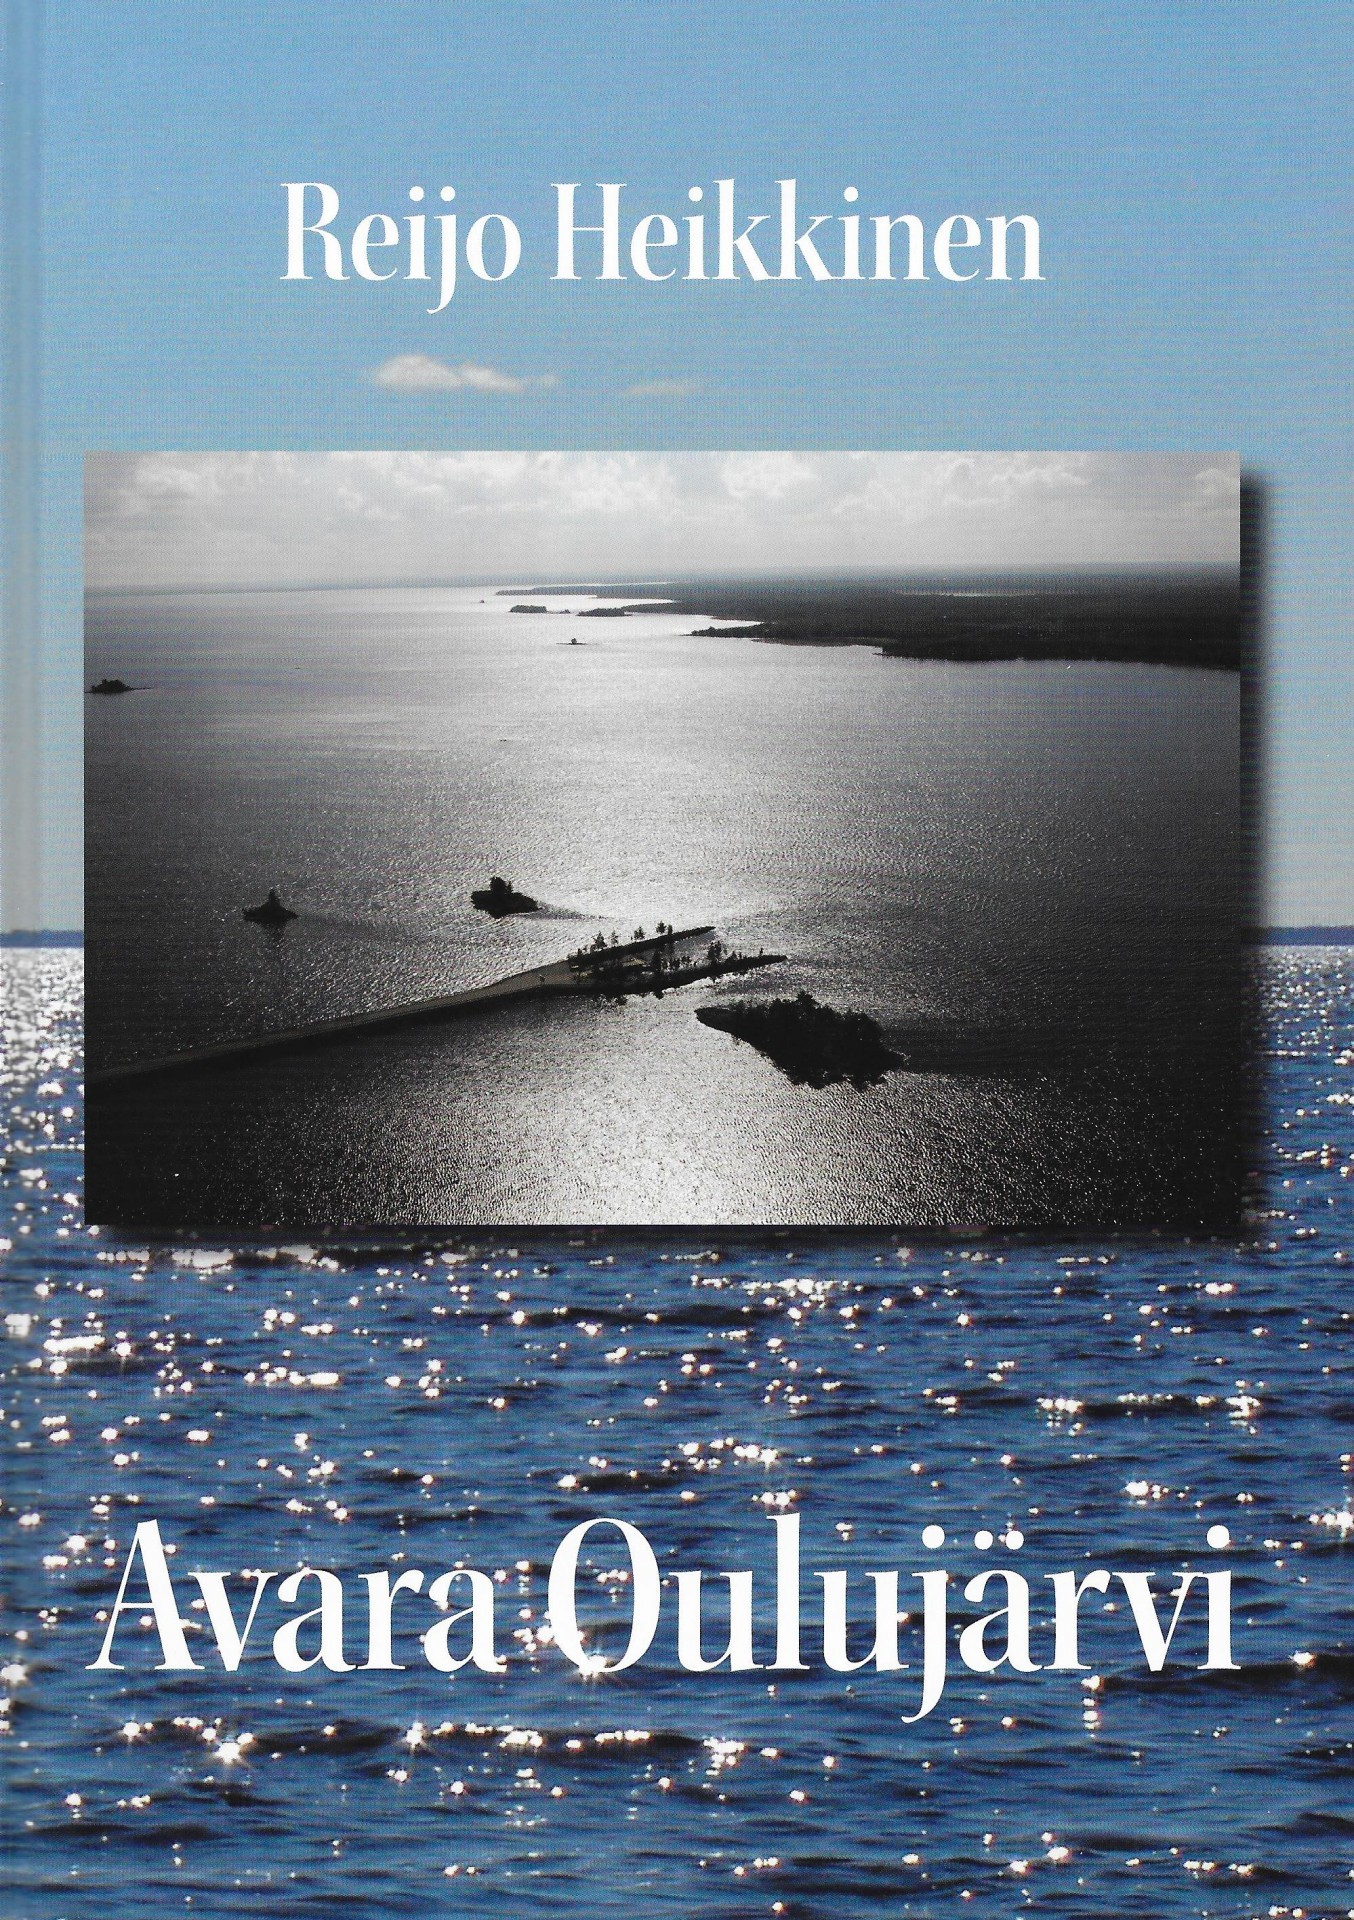 Avara Oulujärvi 2007